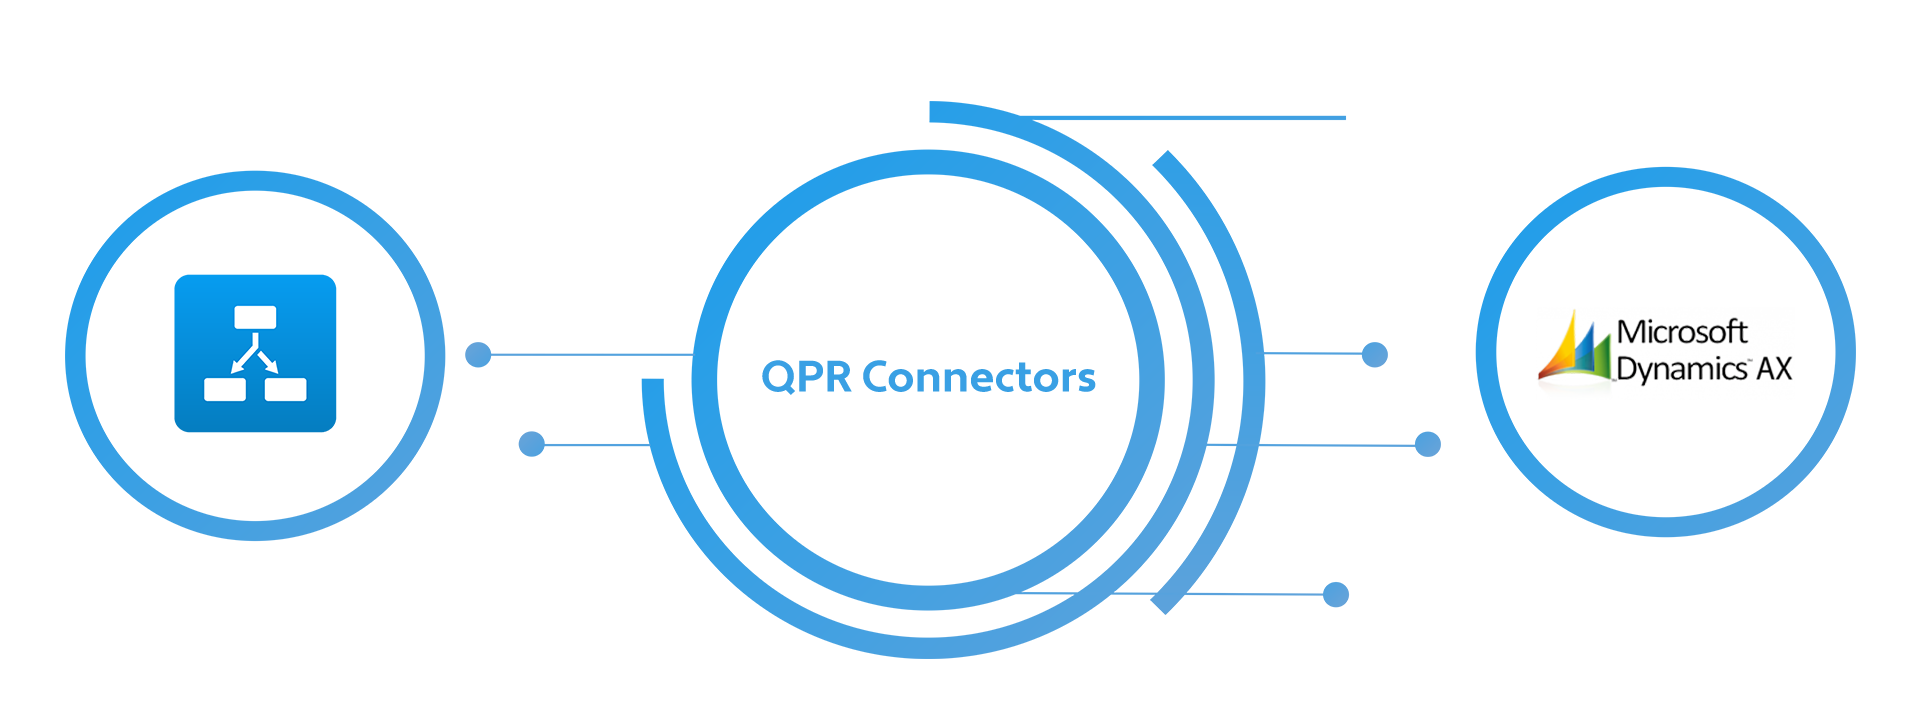 QPR-Connector-Microsoft-Dynamics-AX+Process-Mining